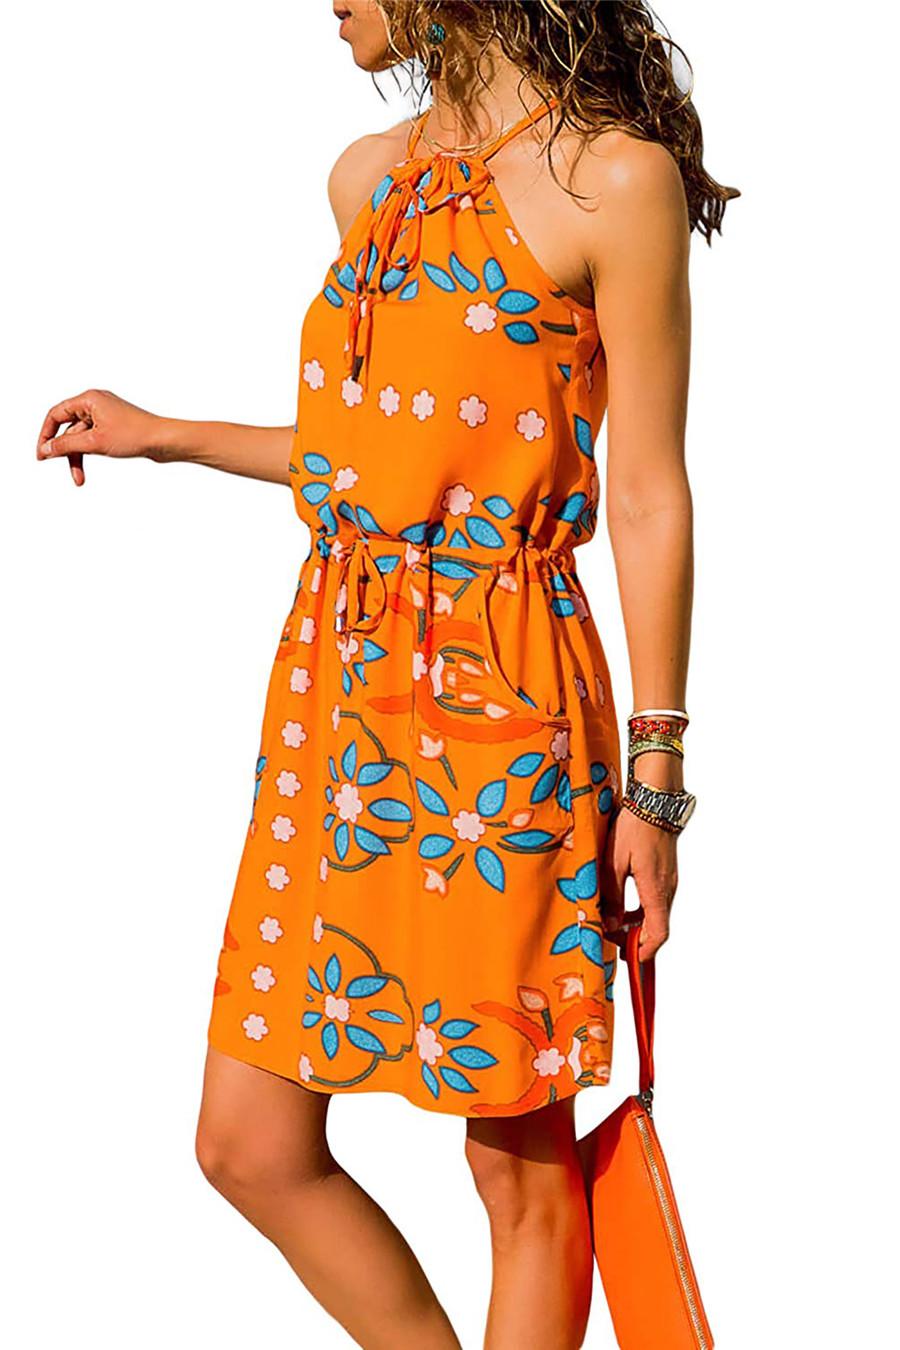 Gladiolus Chiffon Women Summer Dress Spaghetti Strap Floral Print Pocket Sexy Bohemian Beach Dress 2019 Short Ladies Dresses (37)